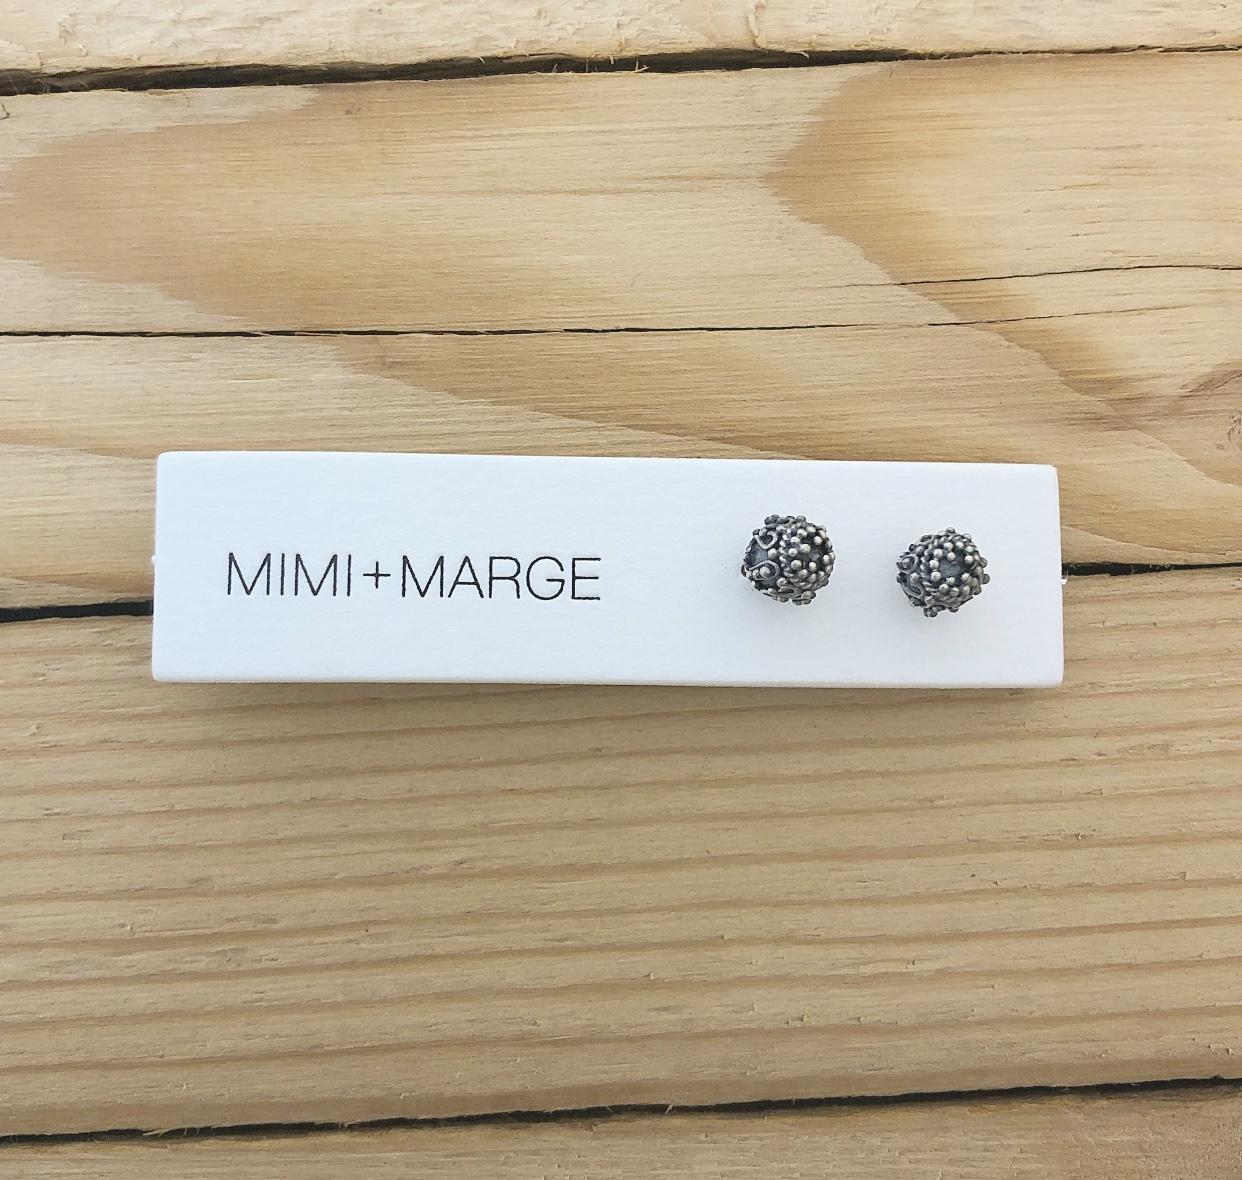 mimi + marge Kebaikan Ball Stud (Sm) Earring